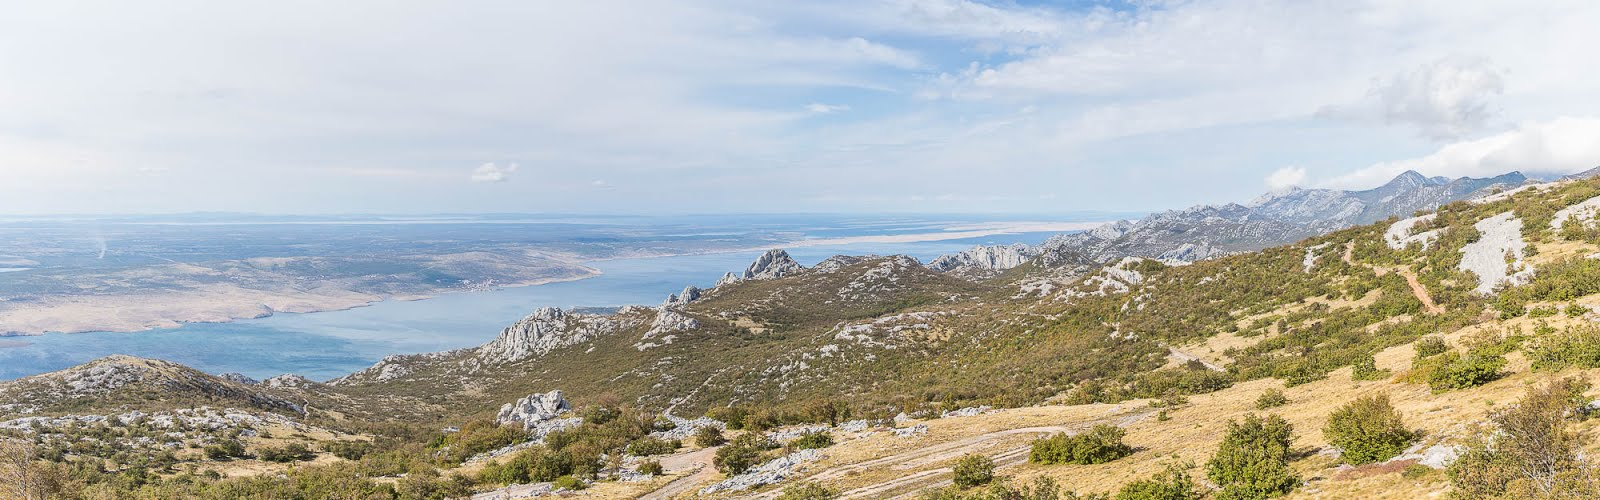 Montagnes Velebit Croatie